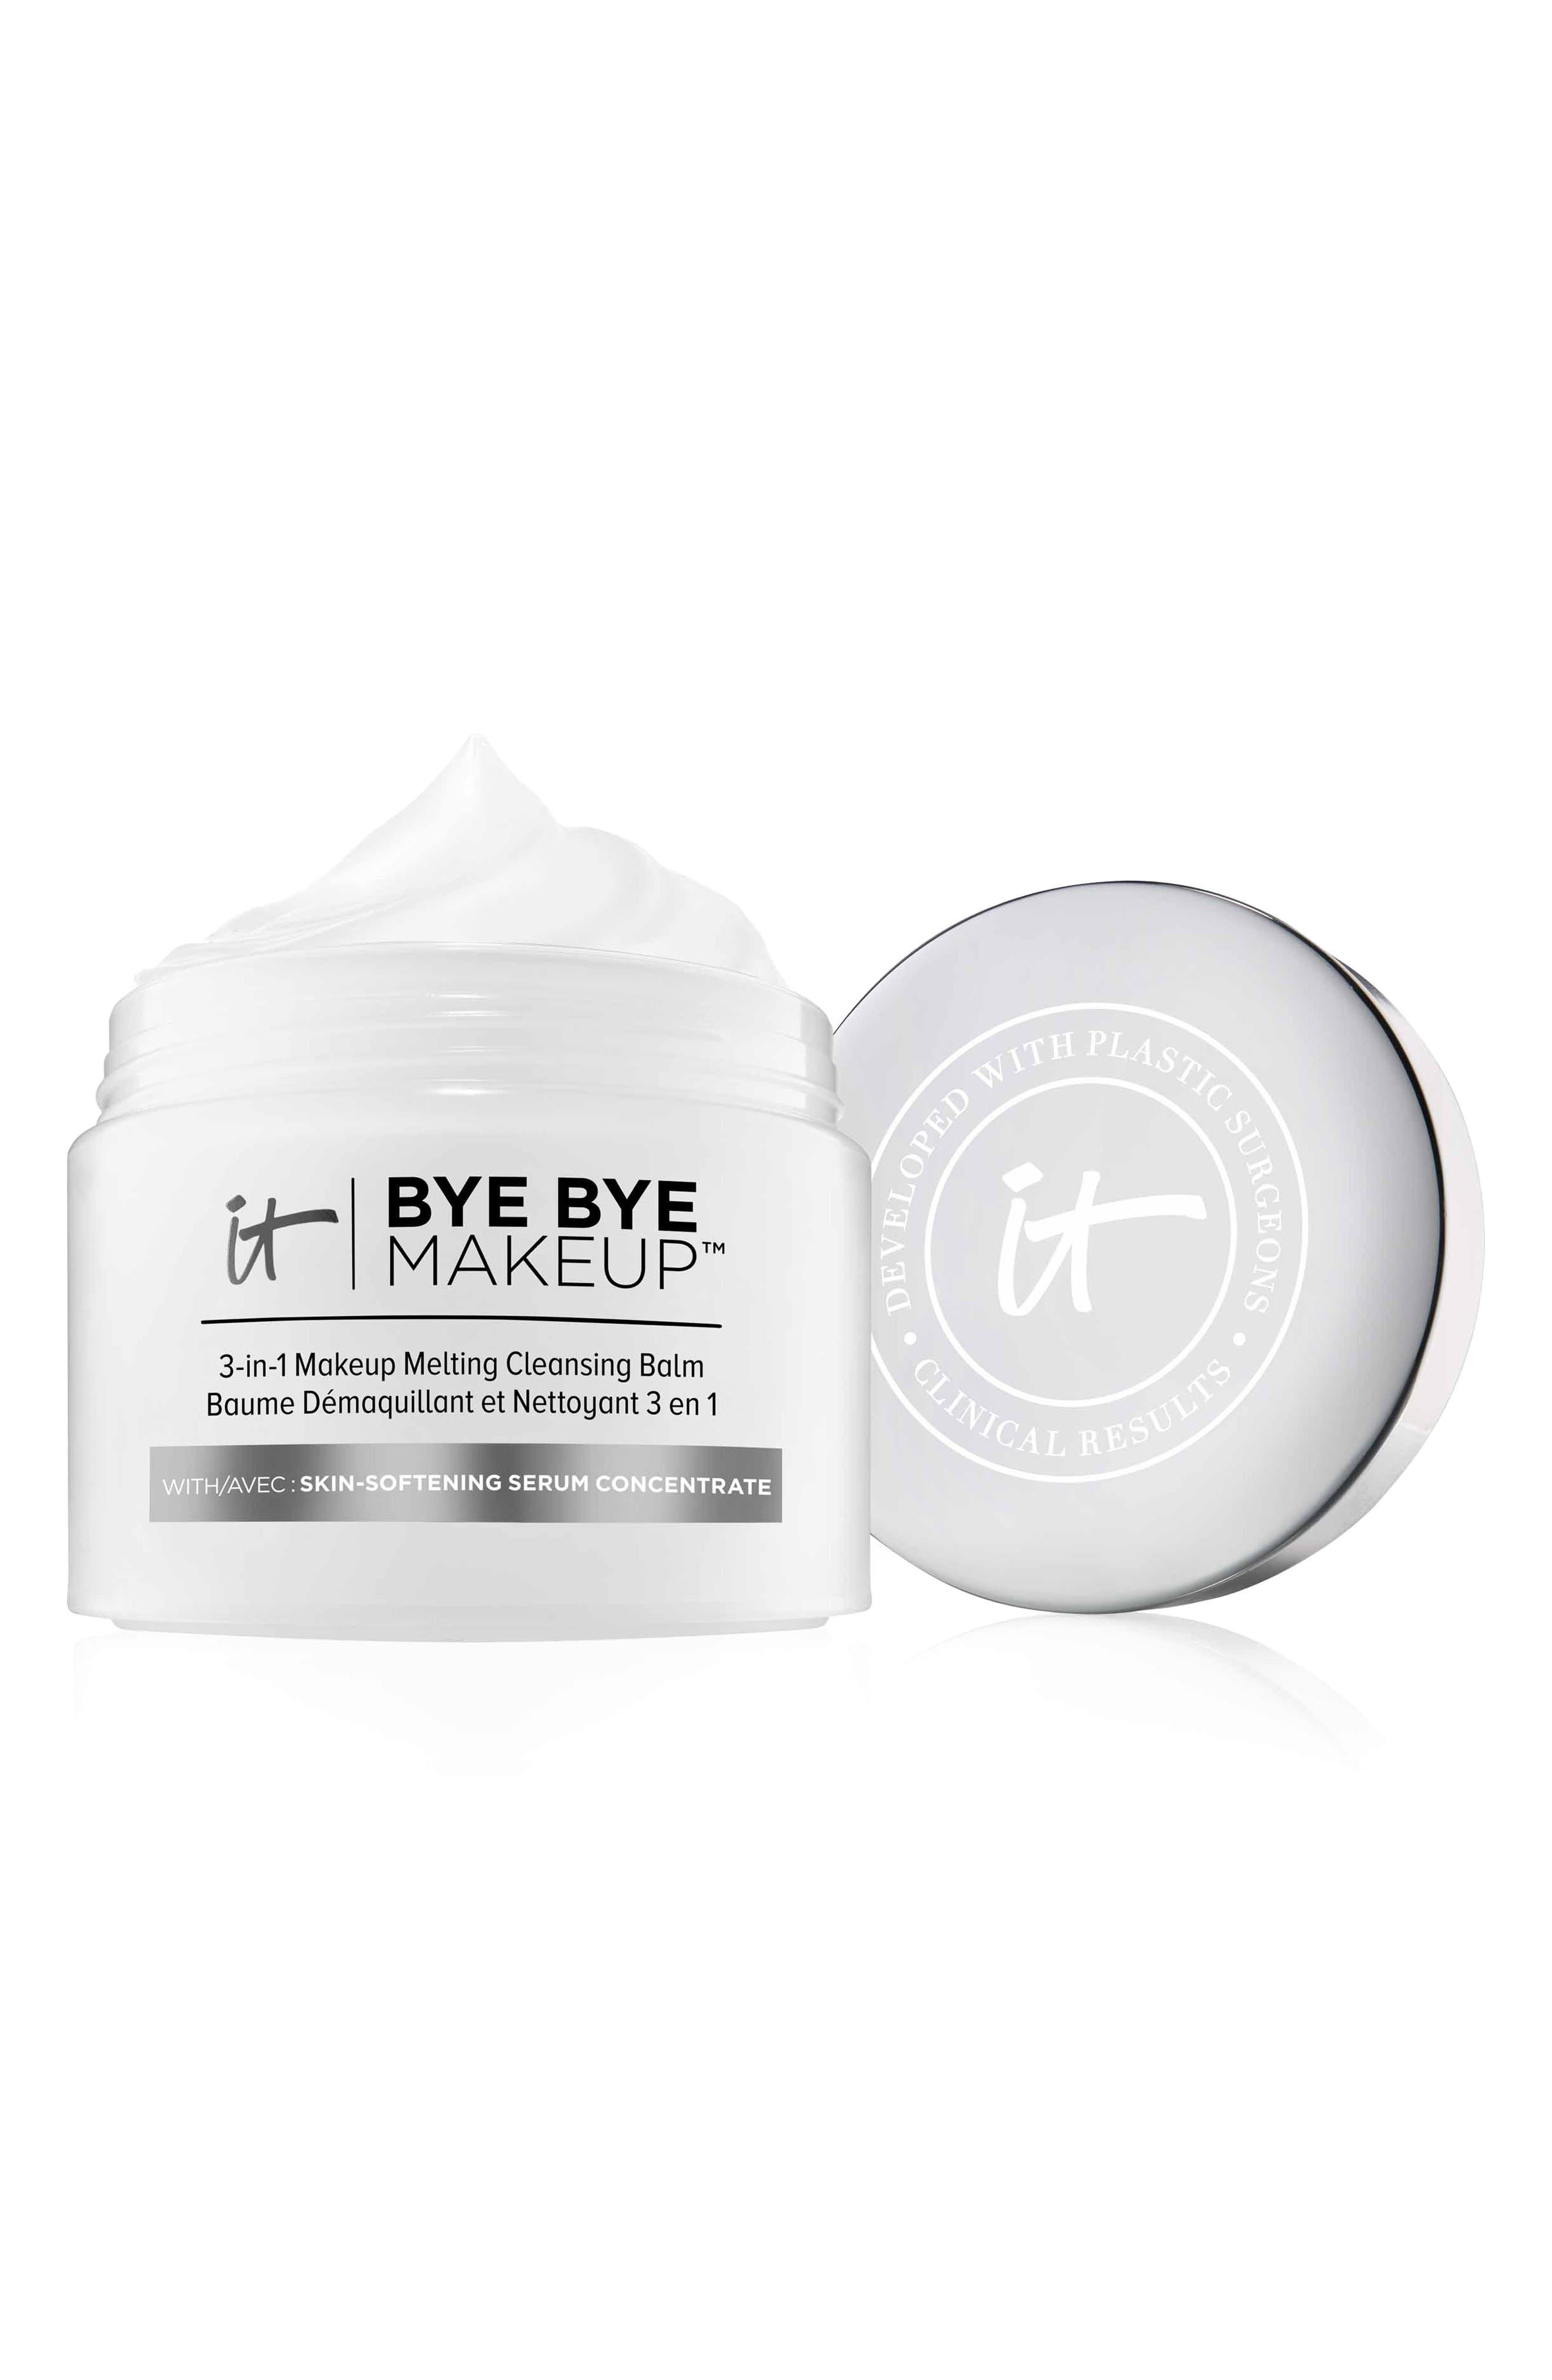 Bye Bye Makeup 3-In-1 Makeup Melting Cleansing Balm